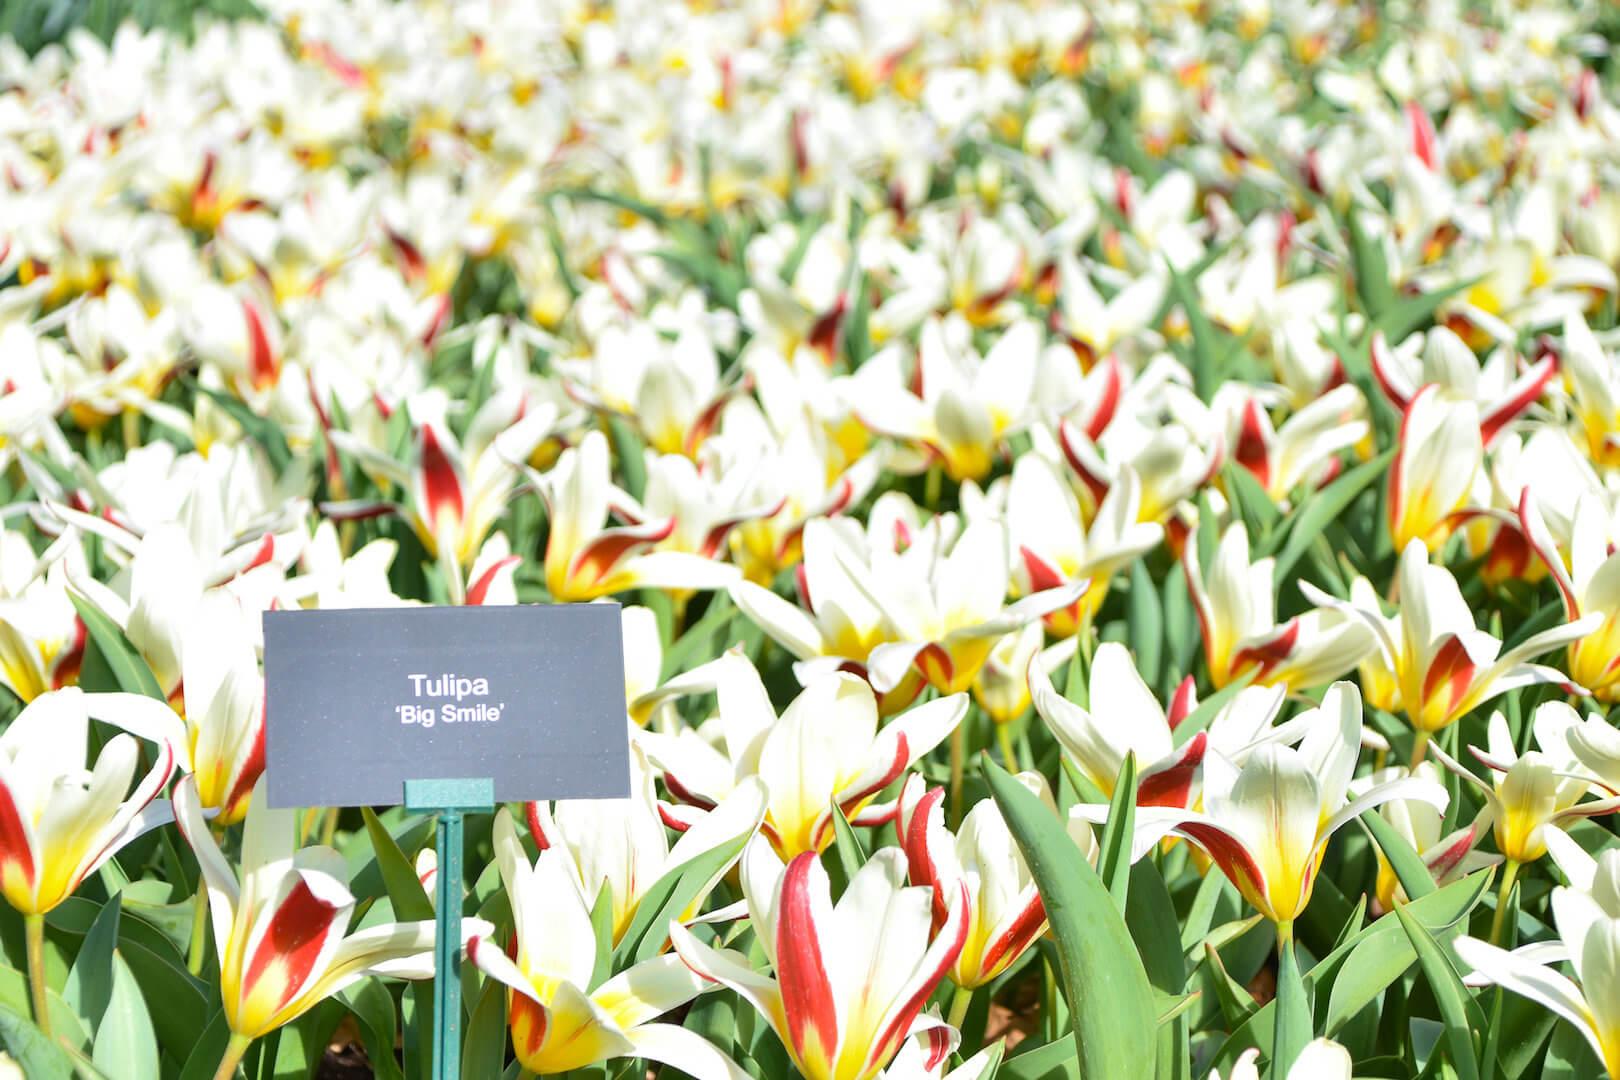 Tulipa 'Big Smile'